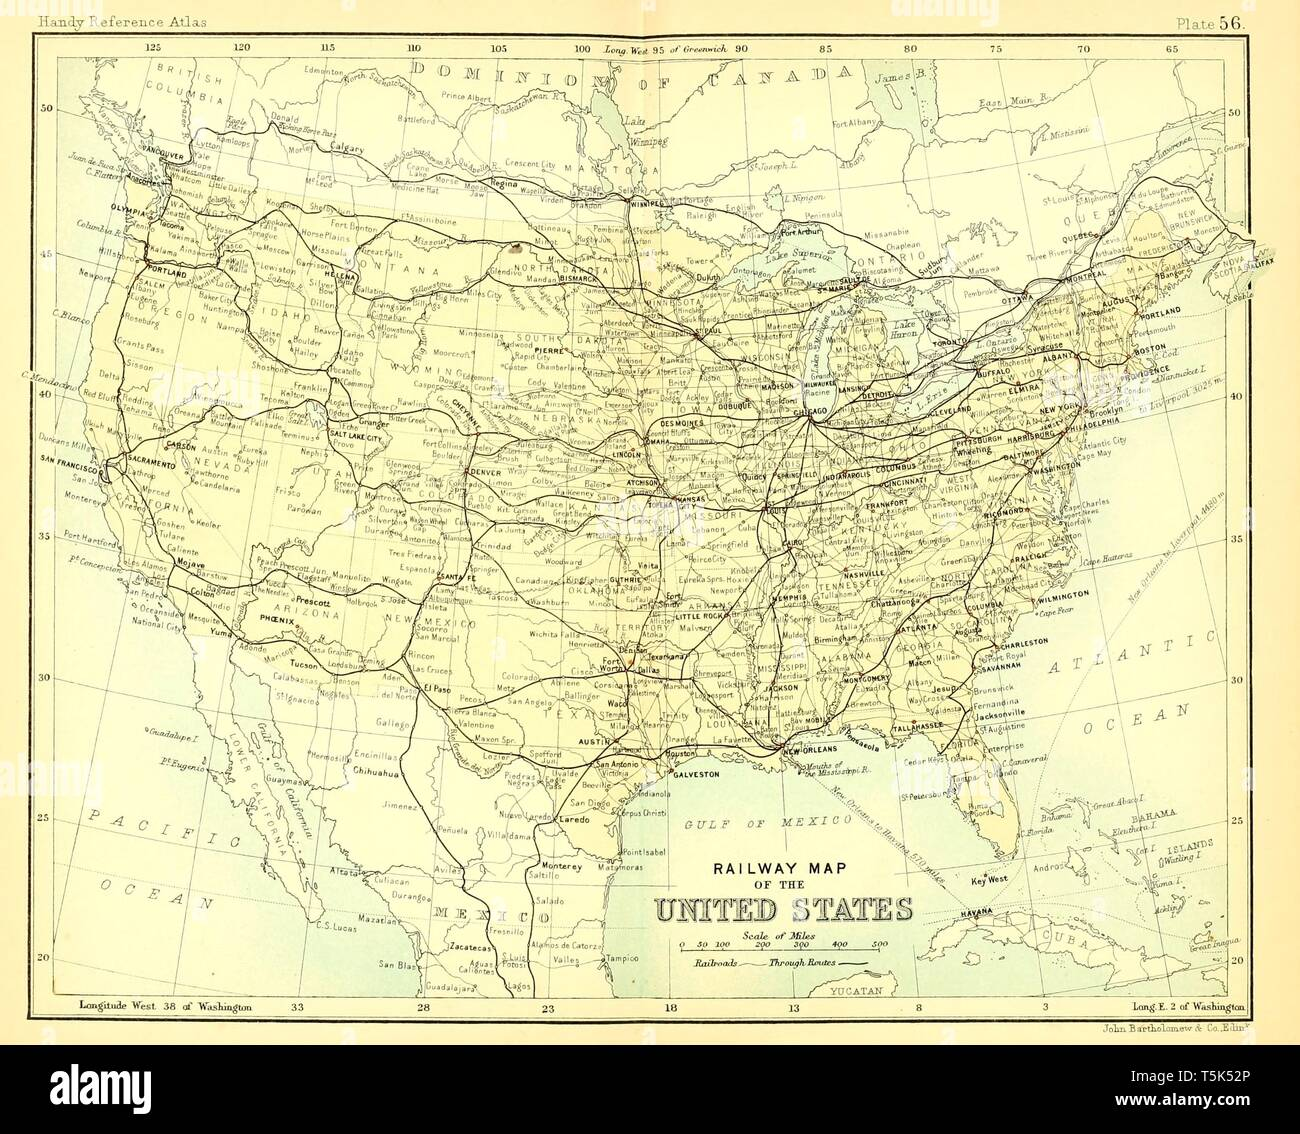 America Usa Map Maps Stockfotos & America Usa Map Maps Bilder - Alamy